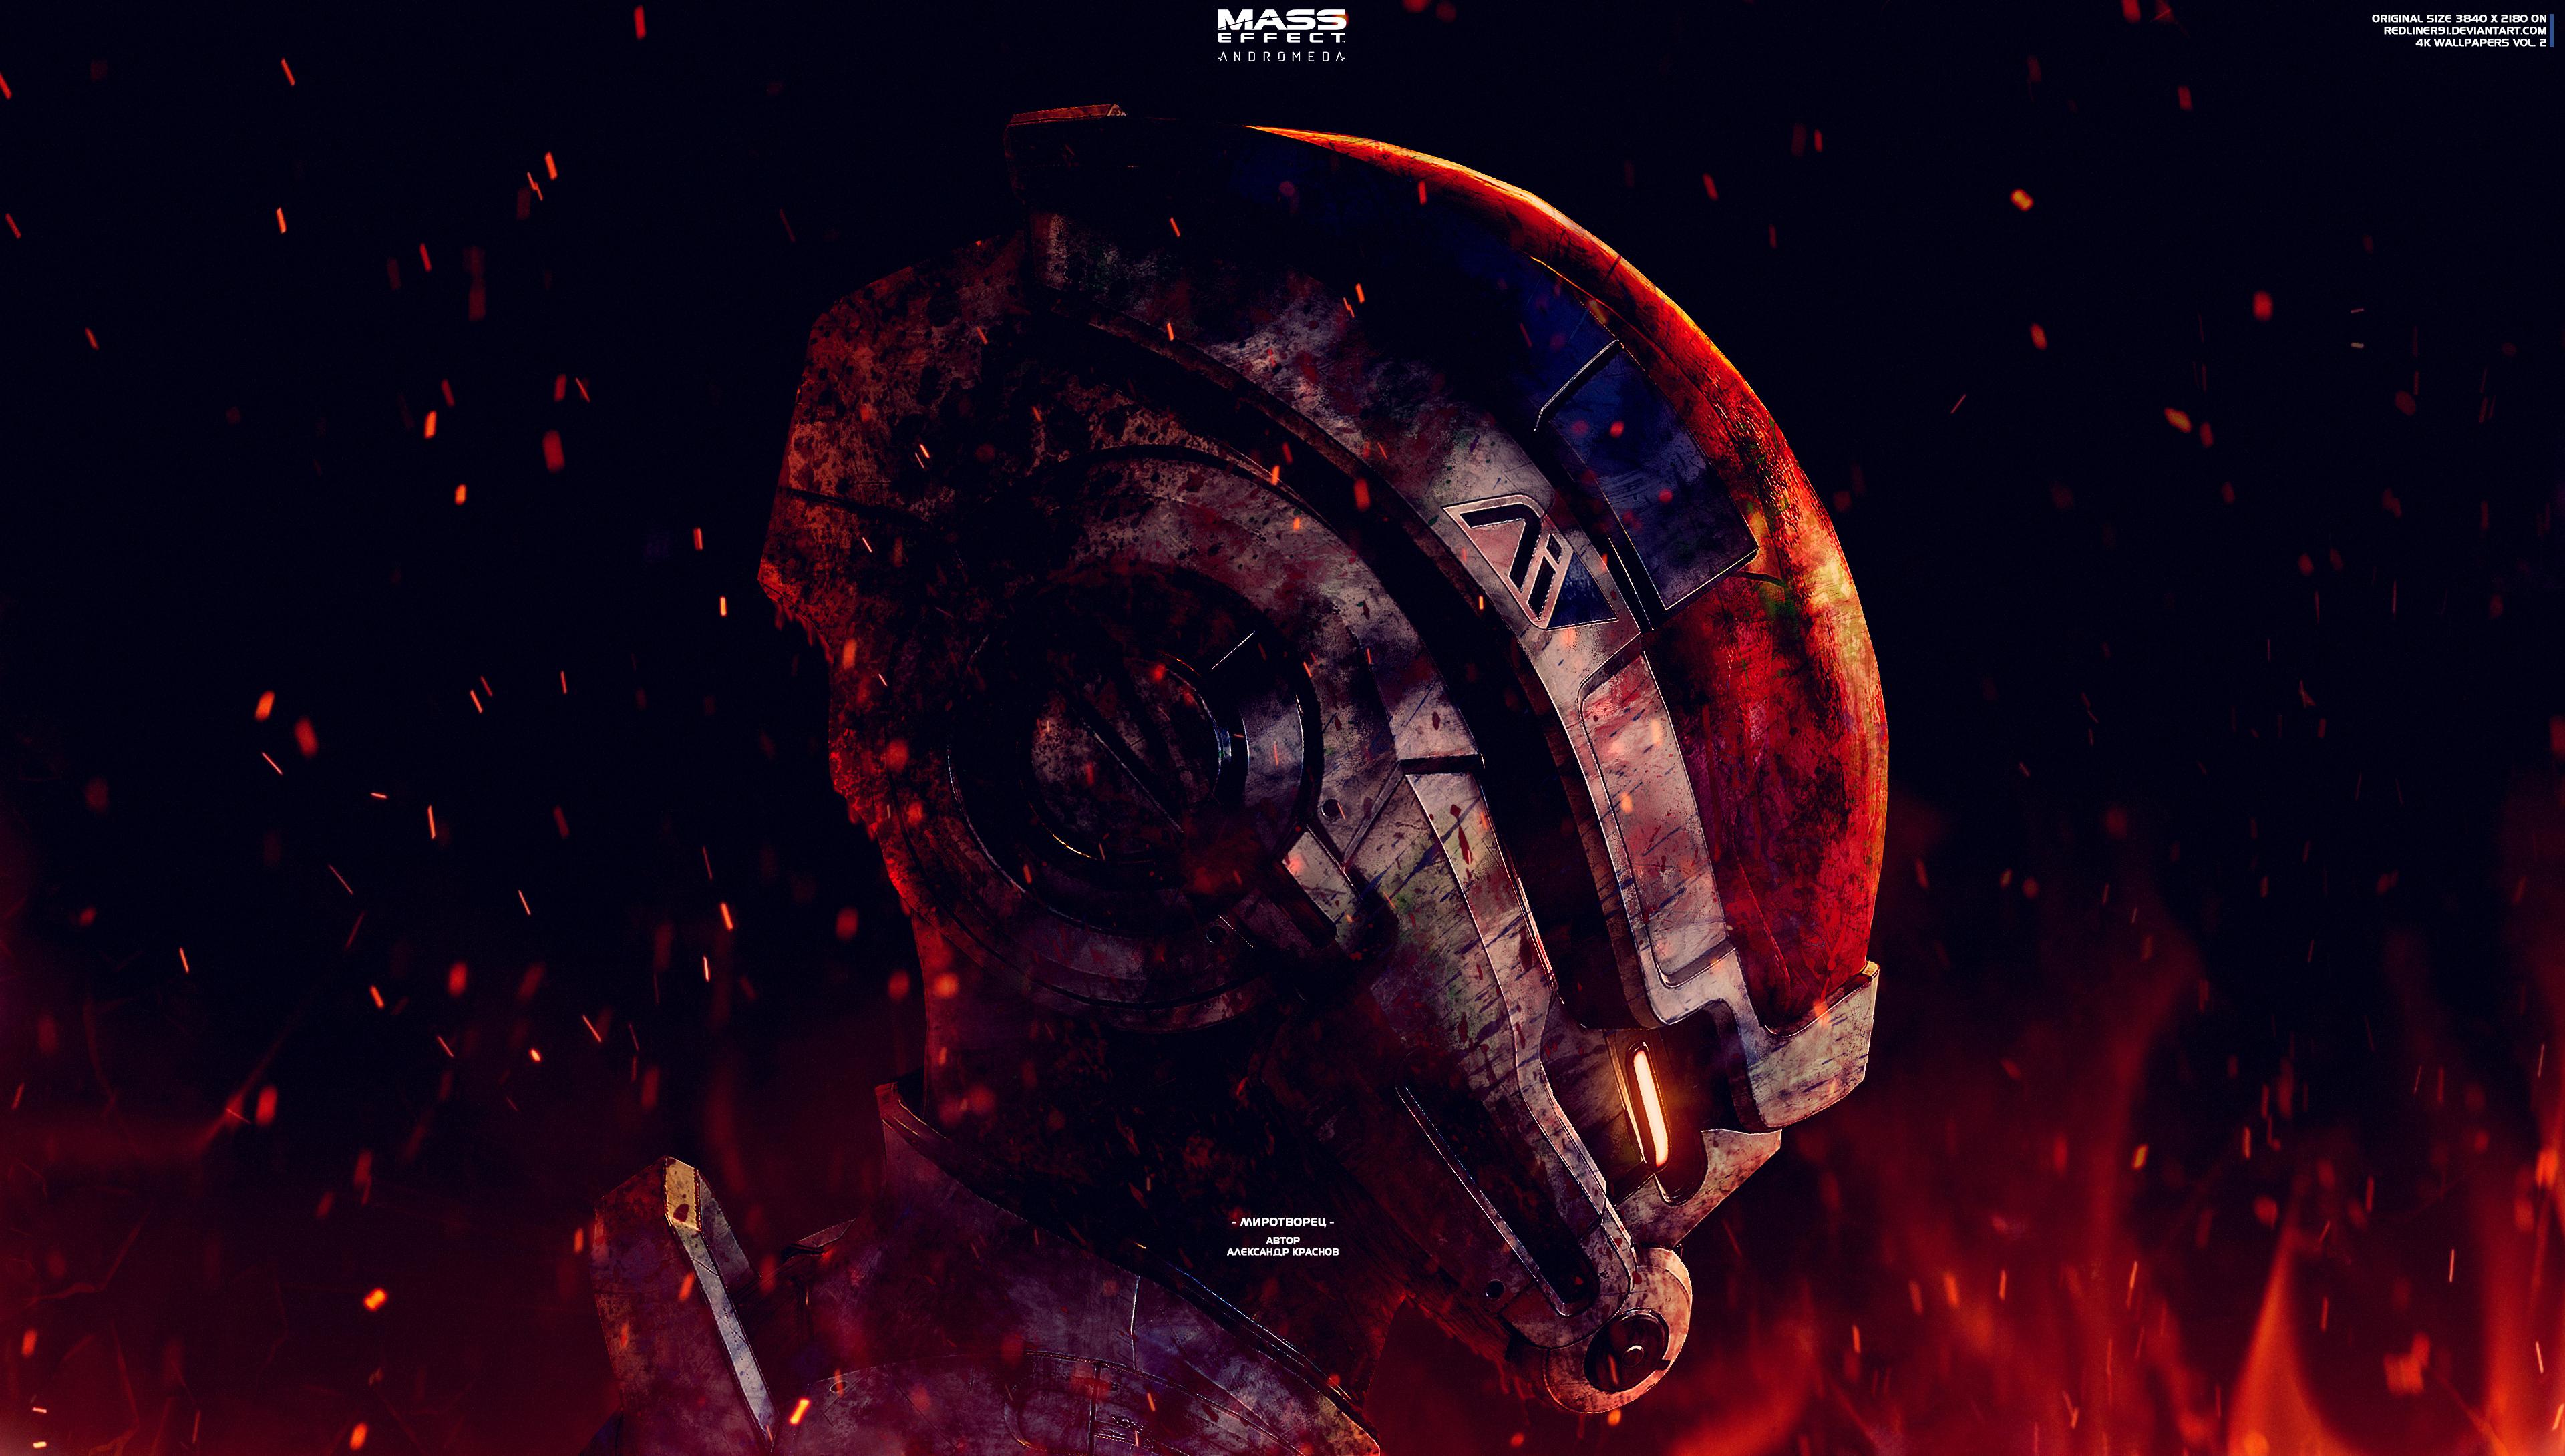 Mass Effect Andromeda HD Artwork, HD Games, 4k Wallpapers